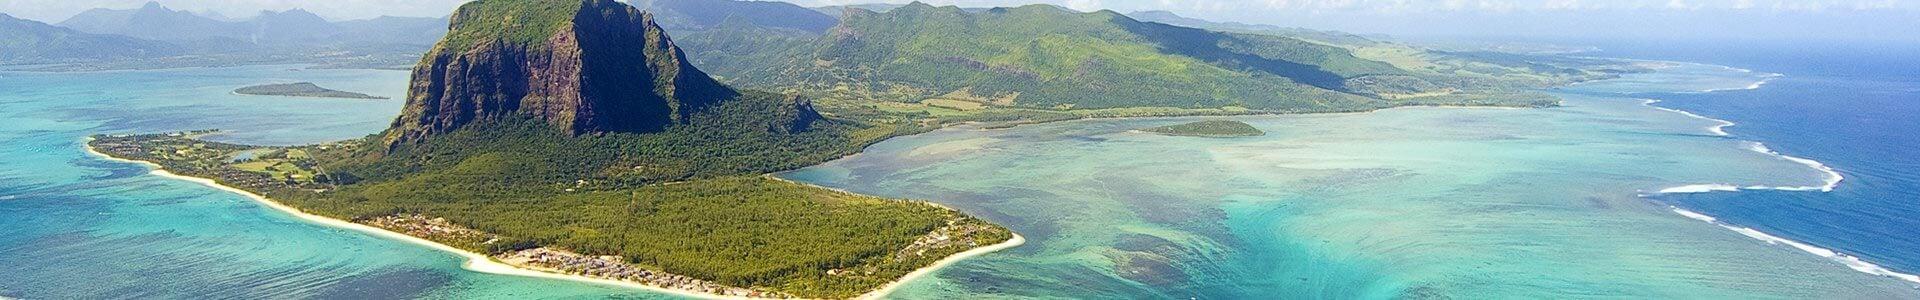 Voyage à l'ïle Maurice - TUI